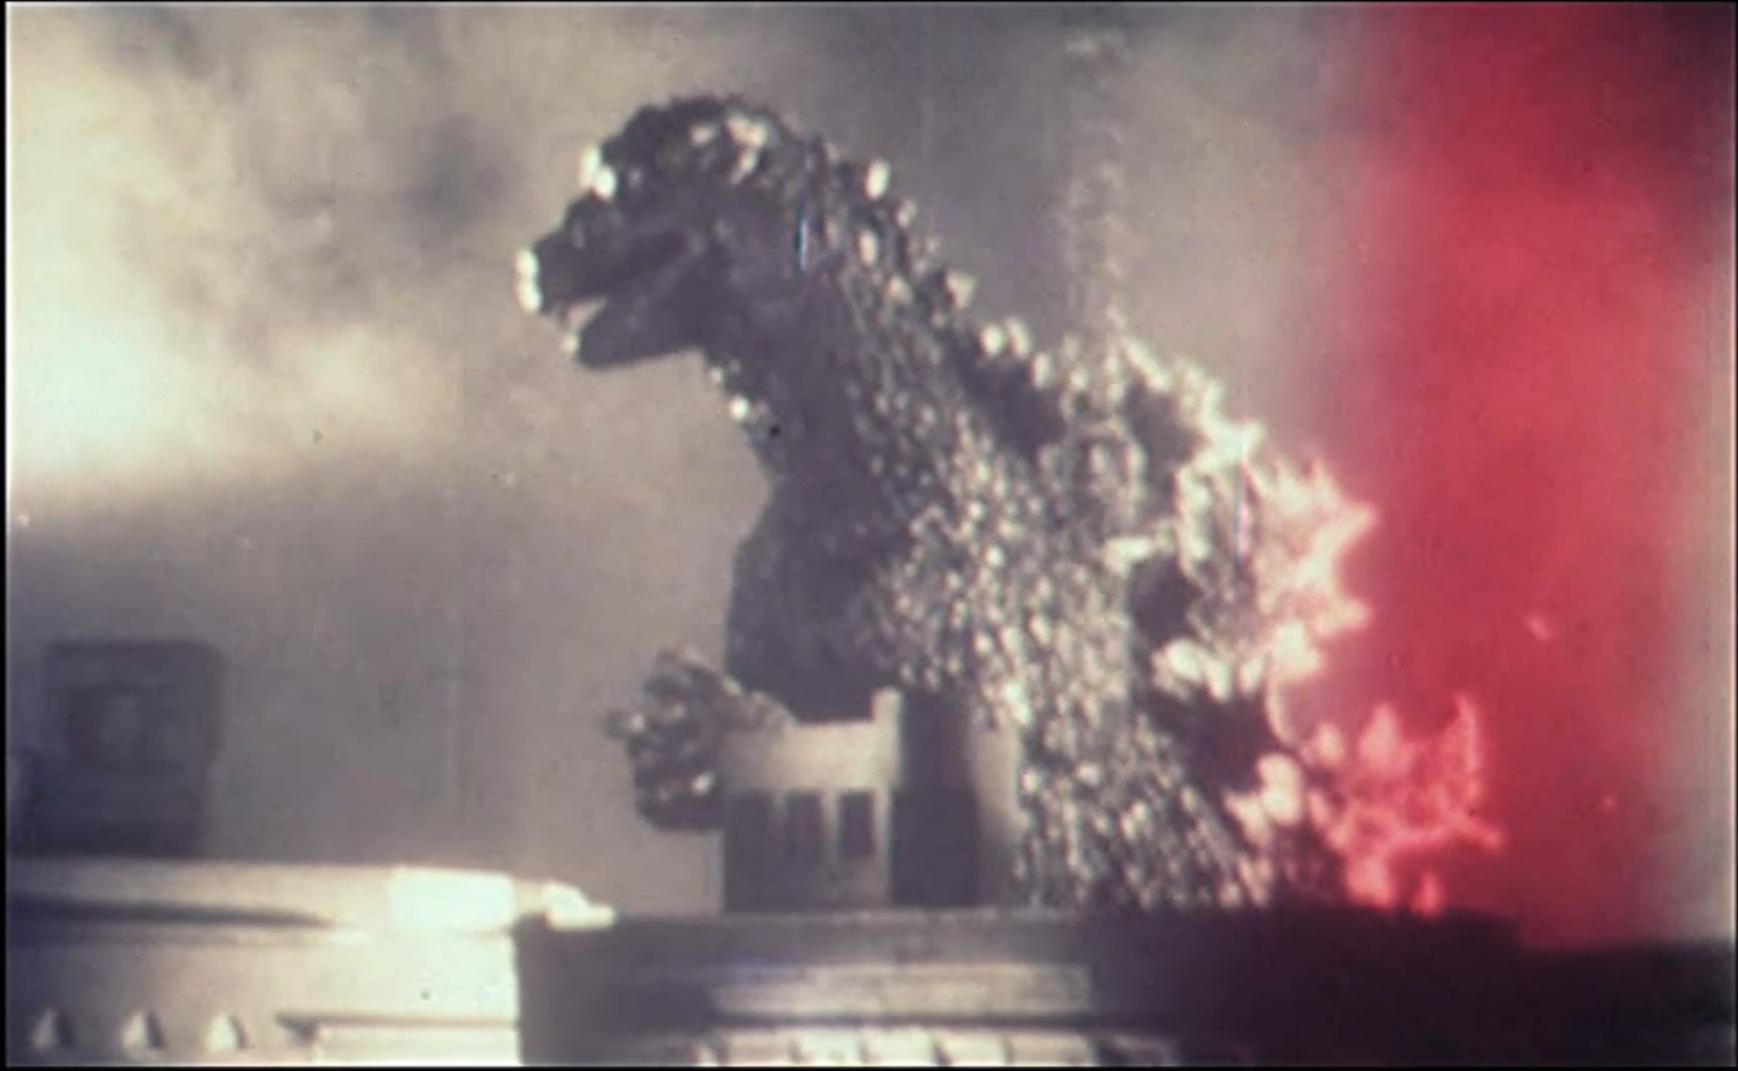 Luigi Cozzi's Godzilla in all its weird sherbet glory